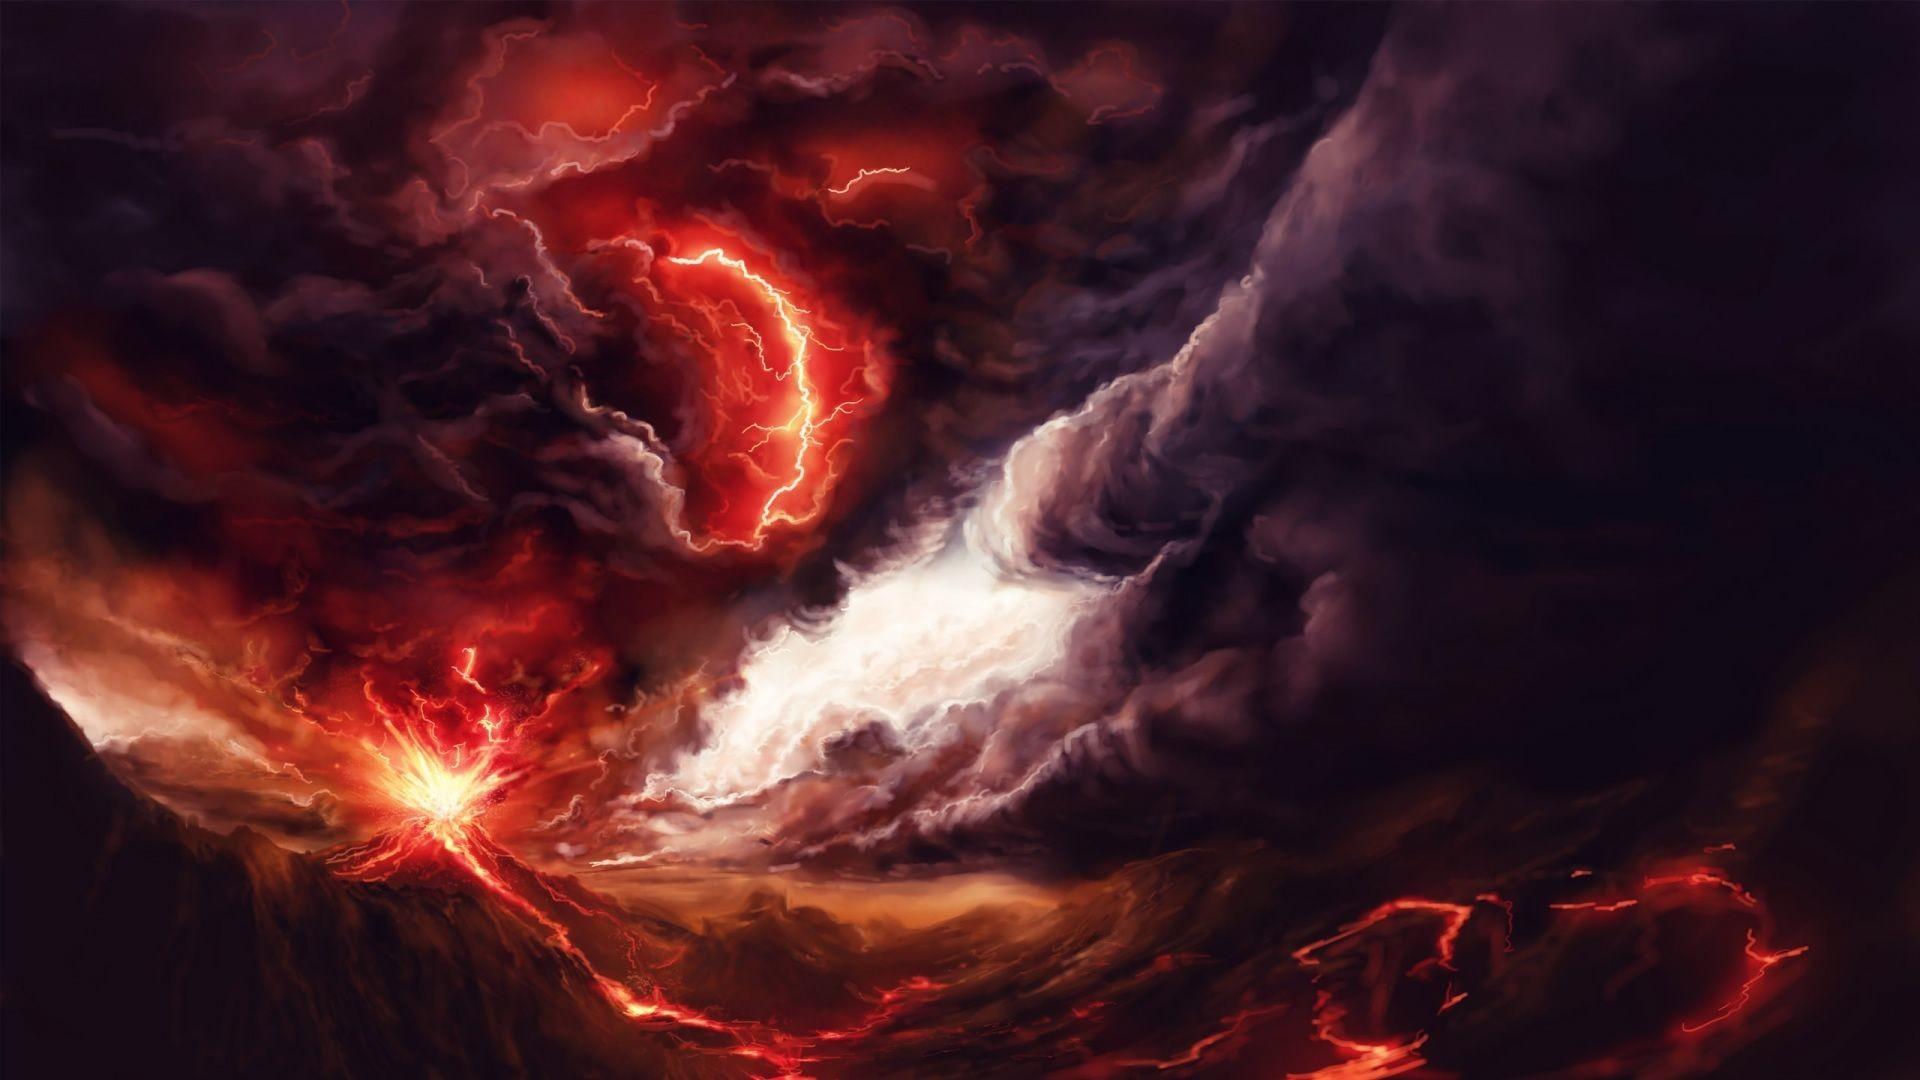 Art volcano explosion fire smoke mountains lightning storm .